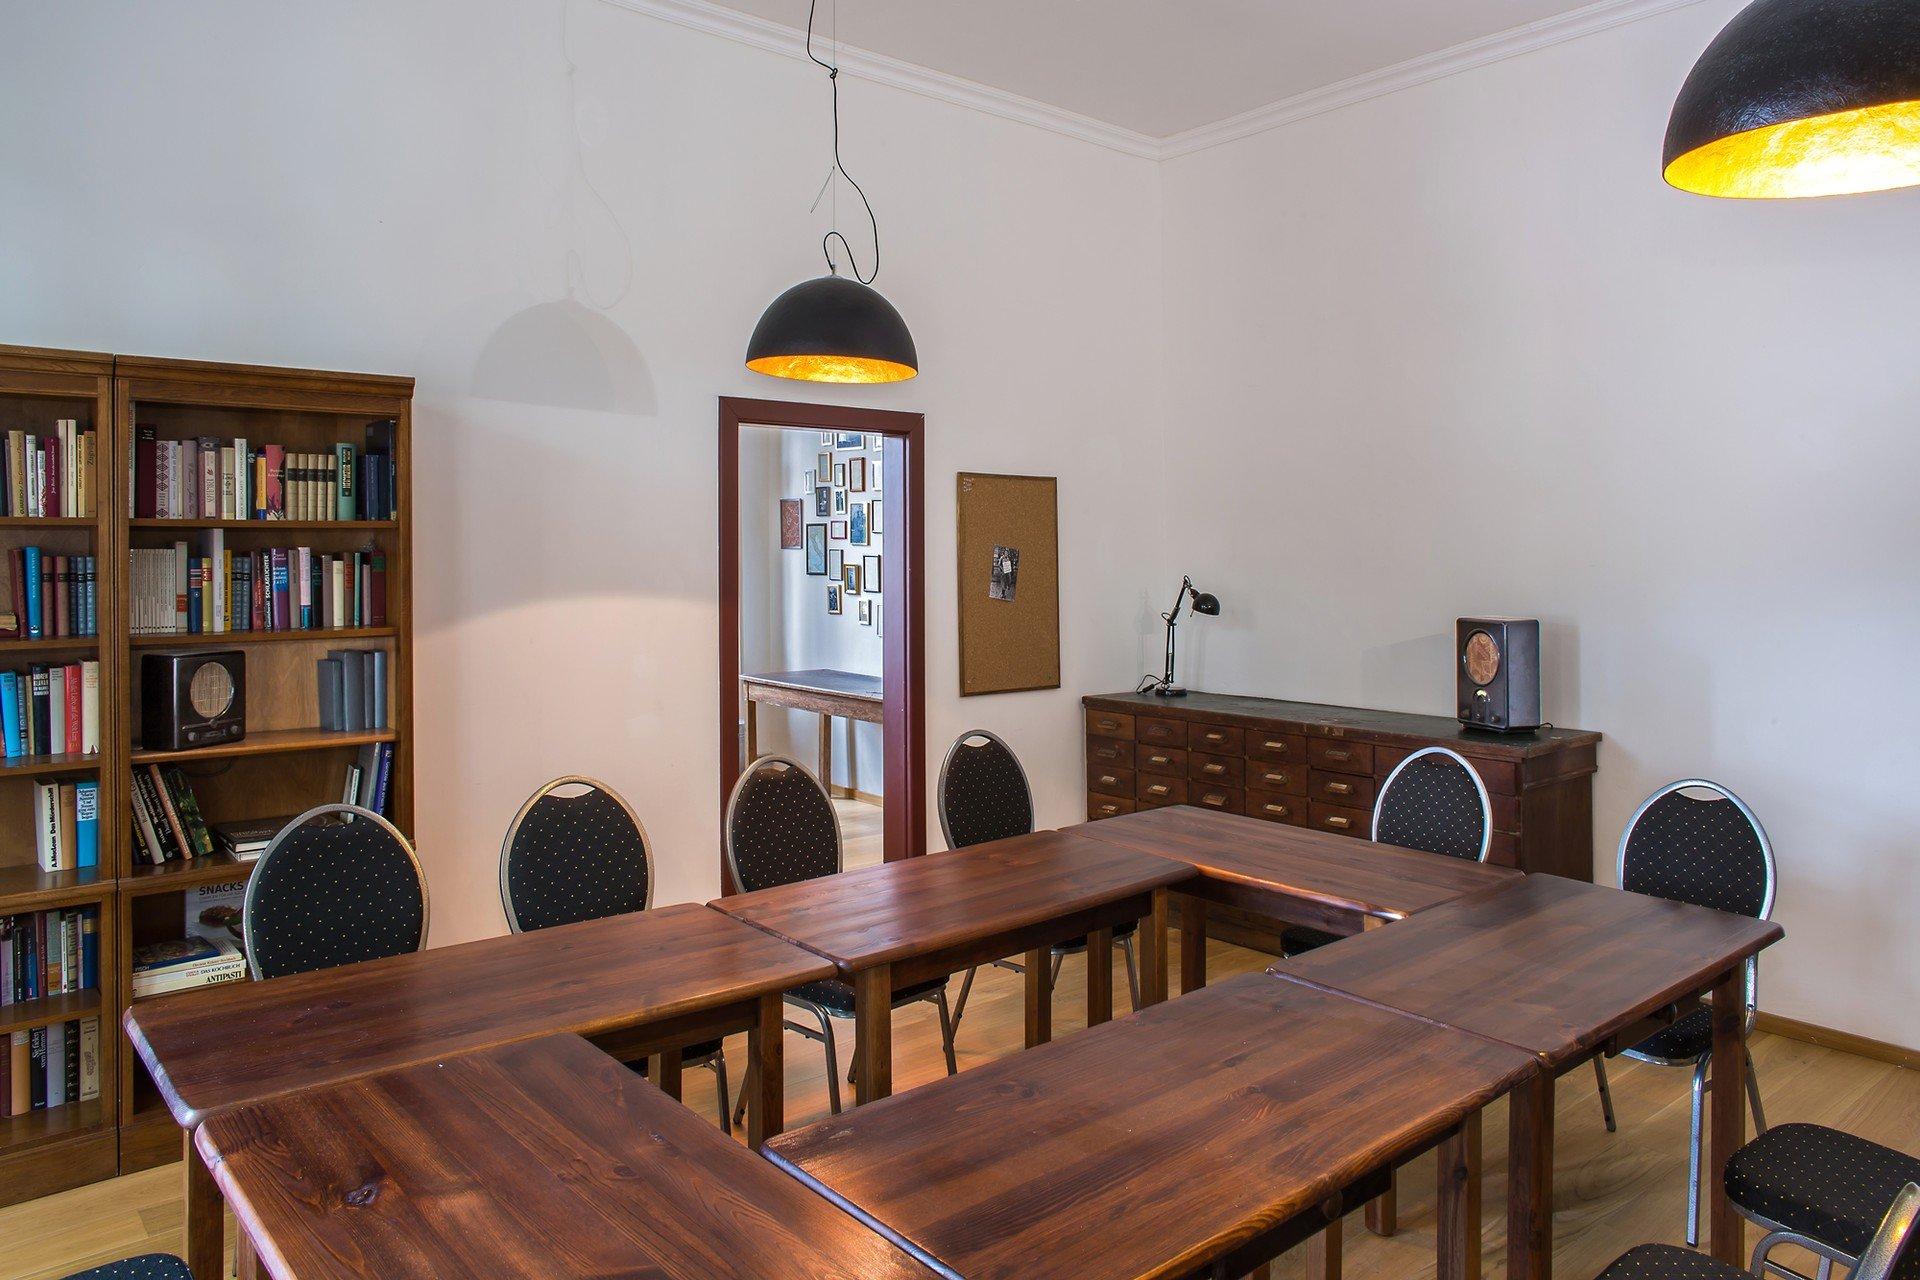 Berlin seminar rooms Meetingraum Alte Börse Marzahn - Alte Bibliothek image 3